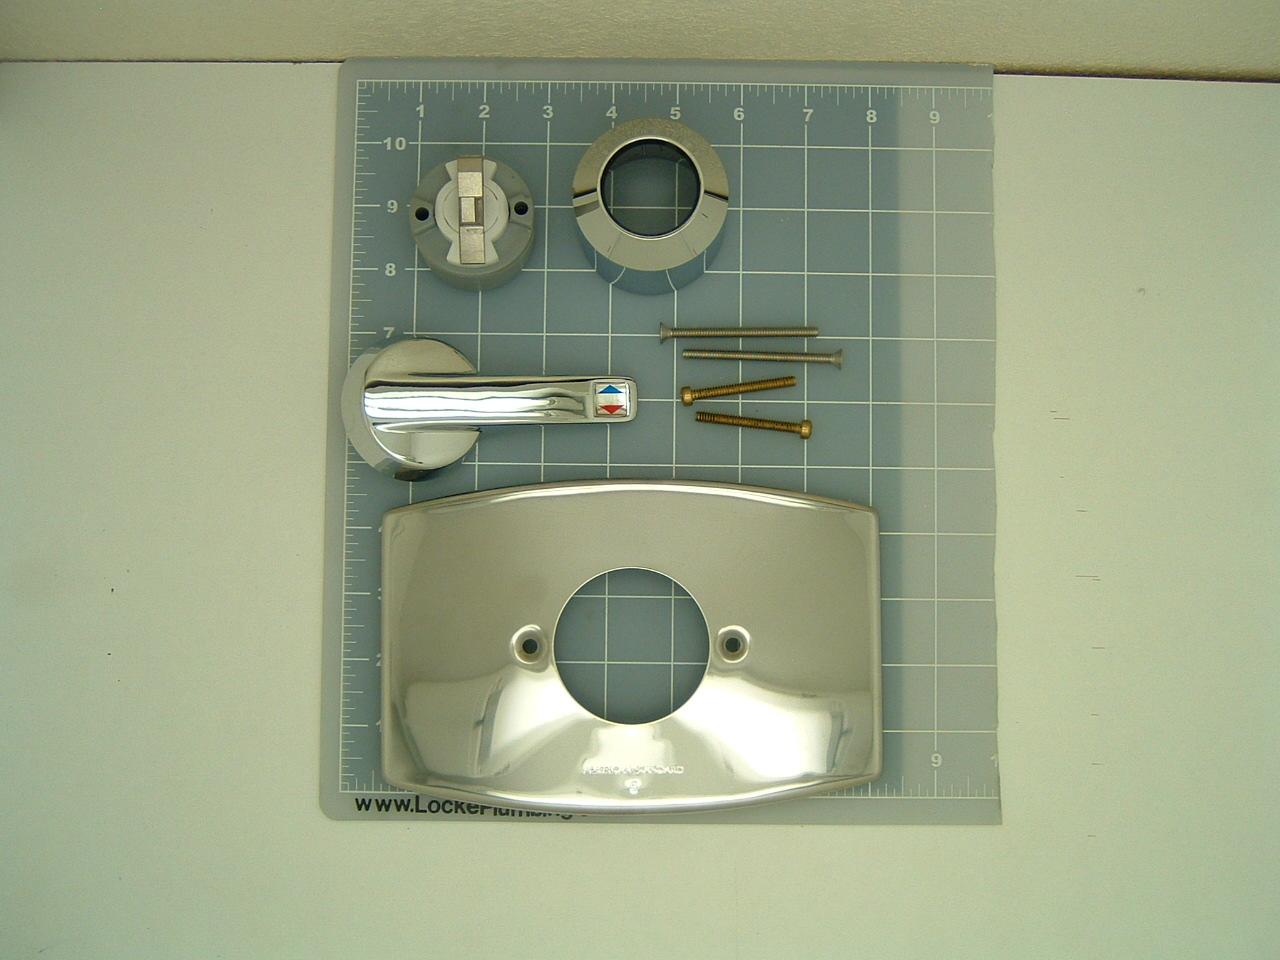 American Standard 1490KIT Complete Aquarian II Faucet ...